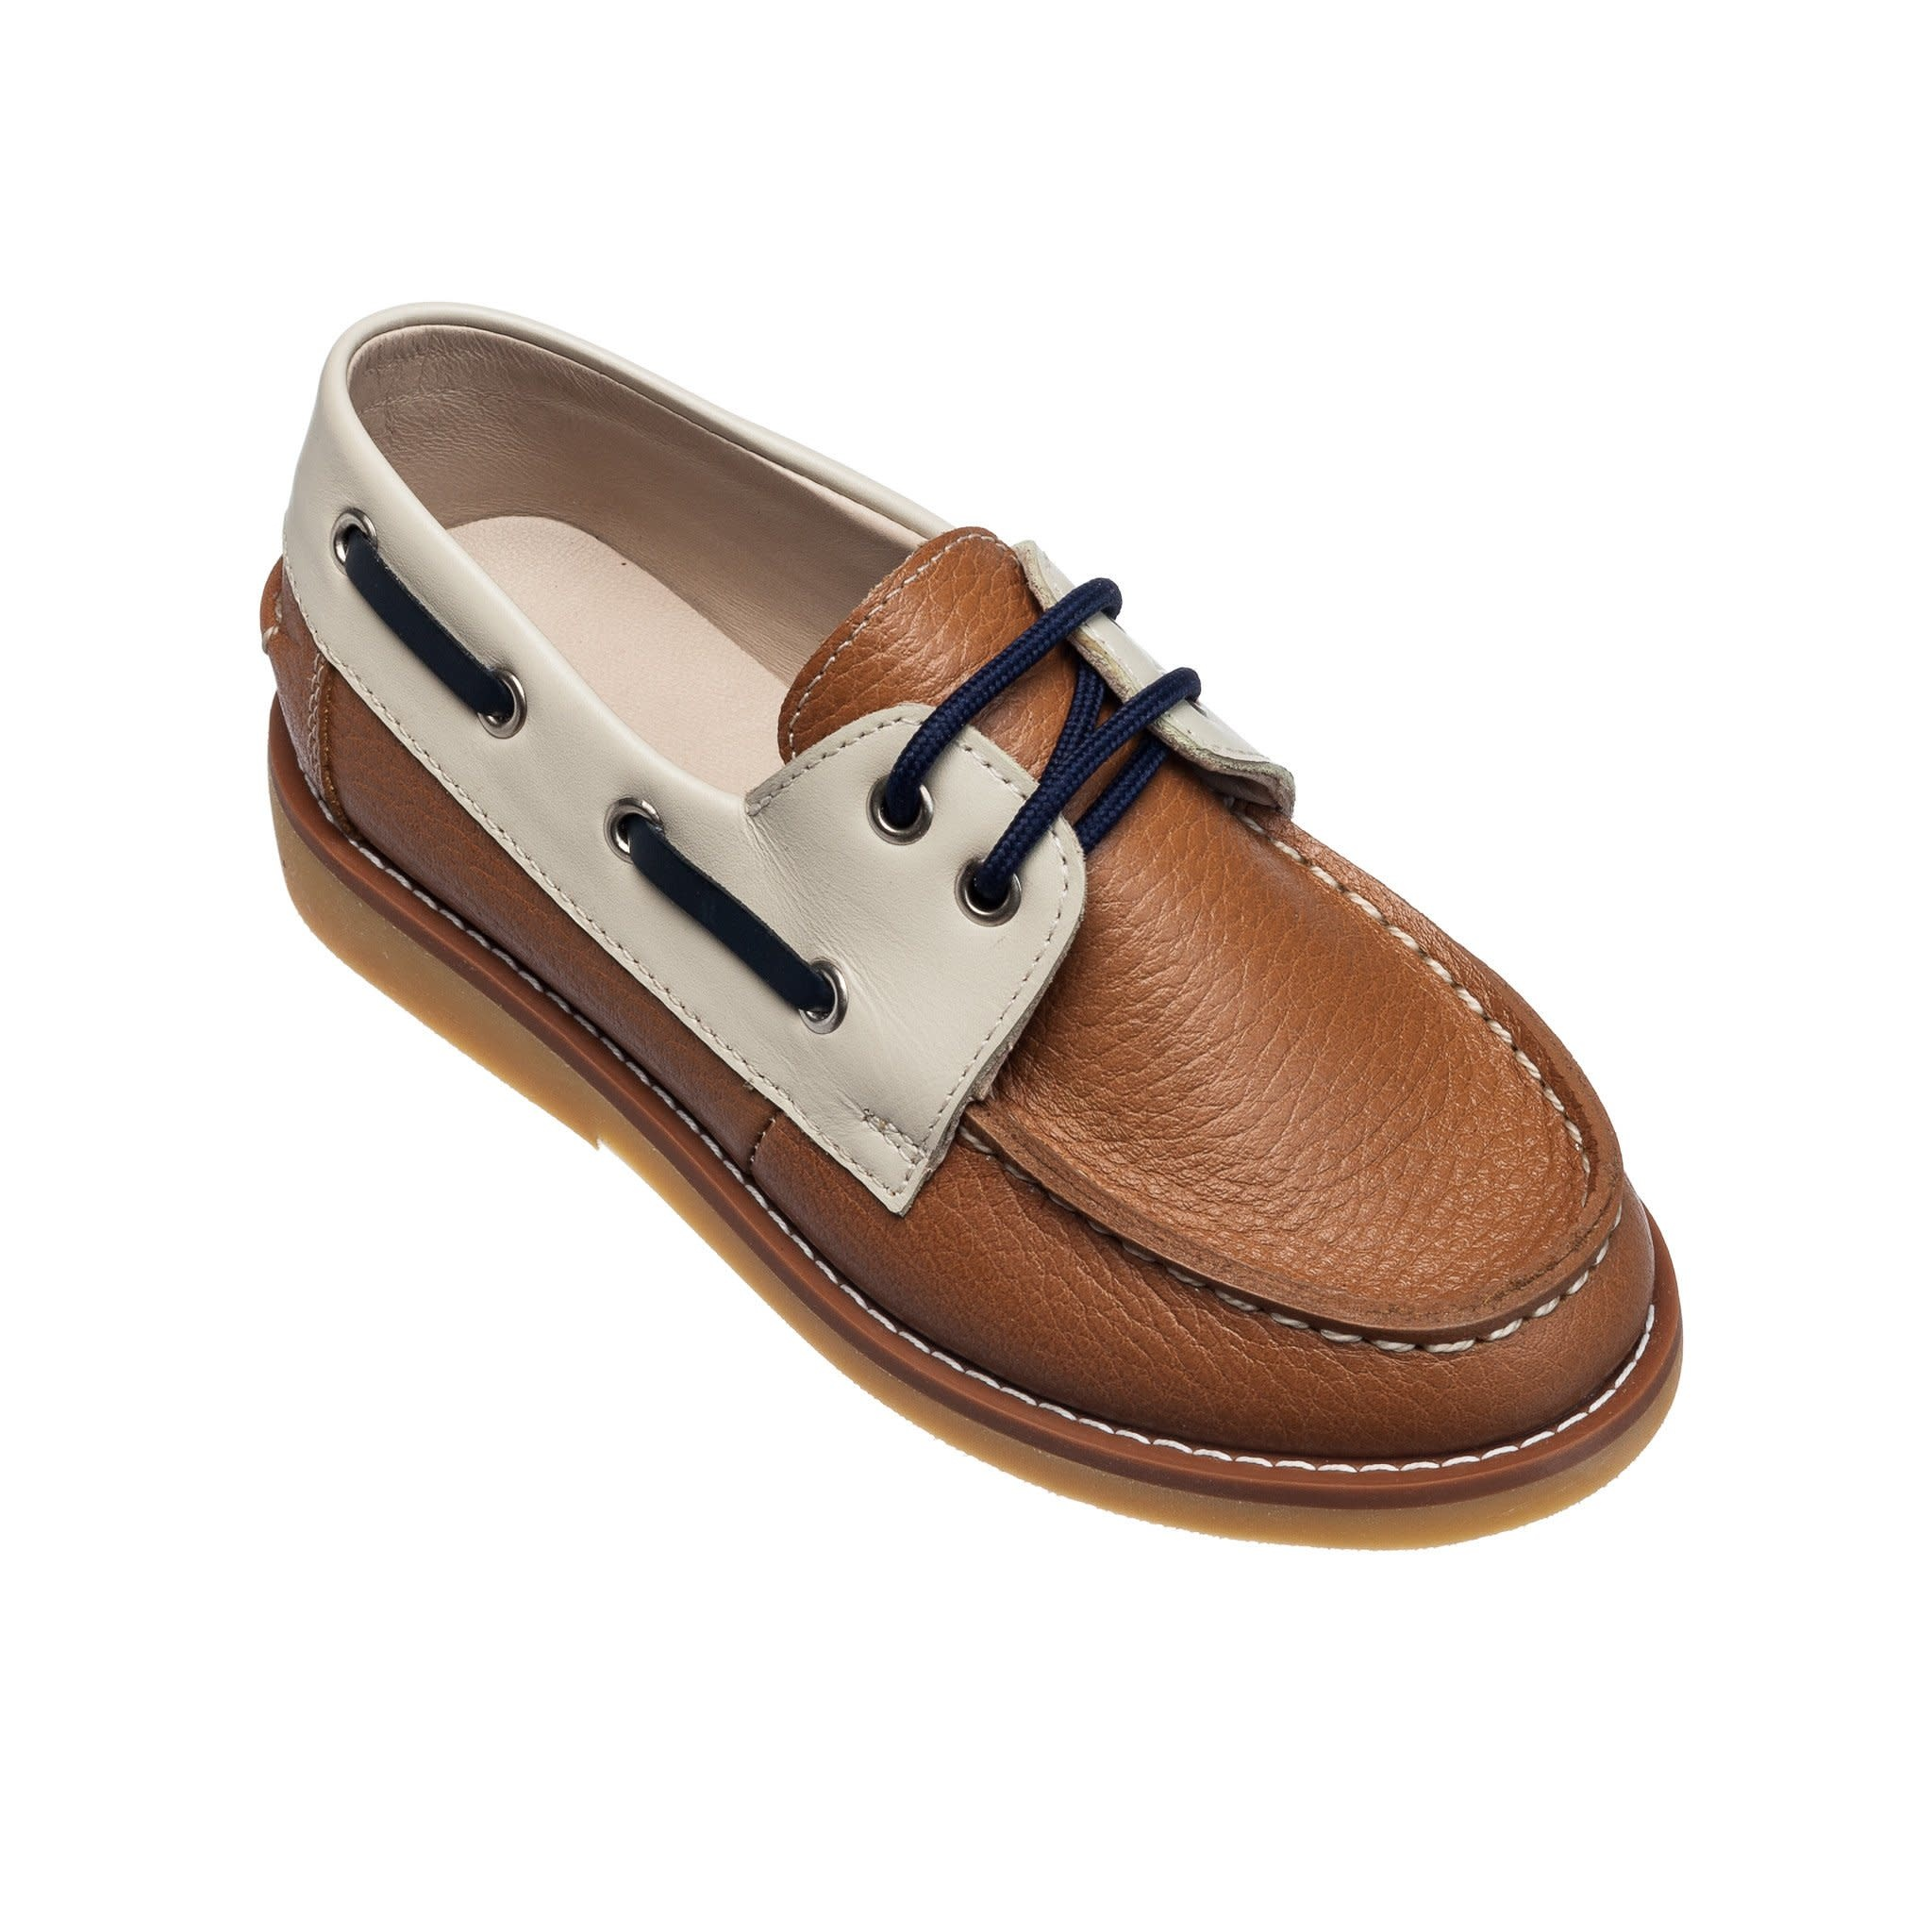 Elephantito Caramel Boat Shoes